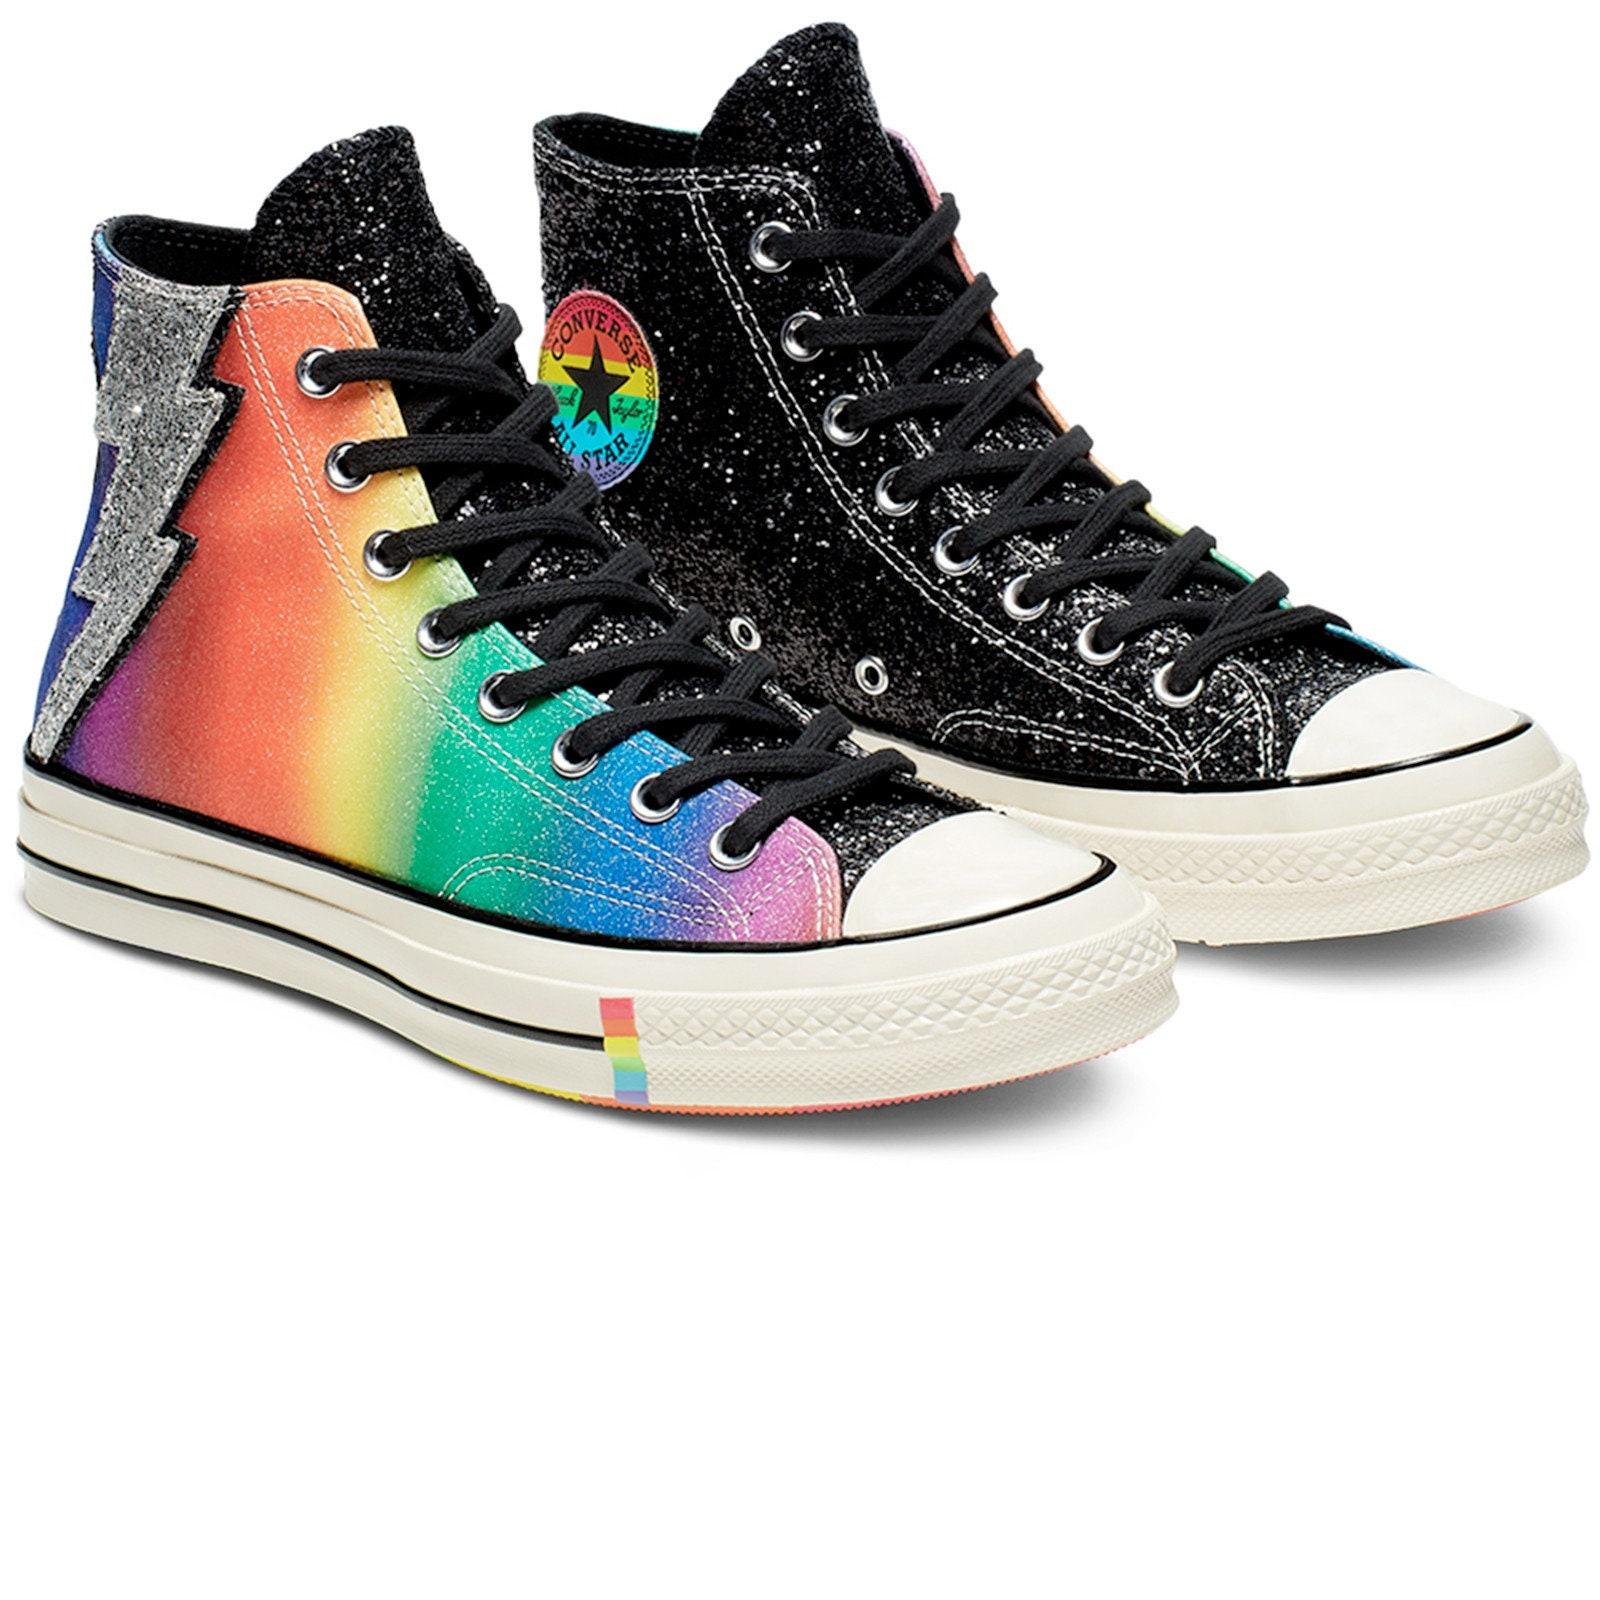 d926017e874fb 70s Pride Converse LGBTQ 2019 Rainbow Multicolor Black High Top ...